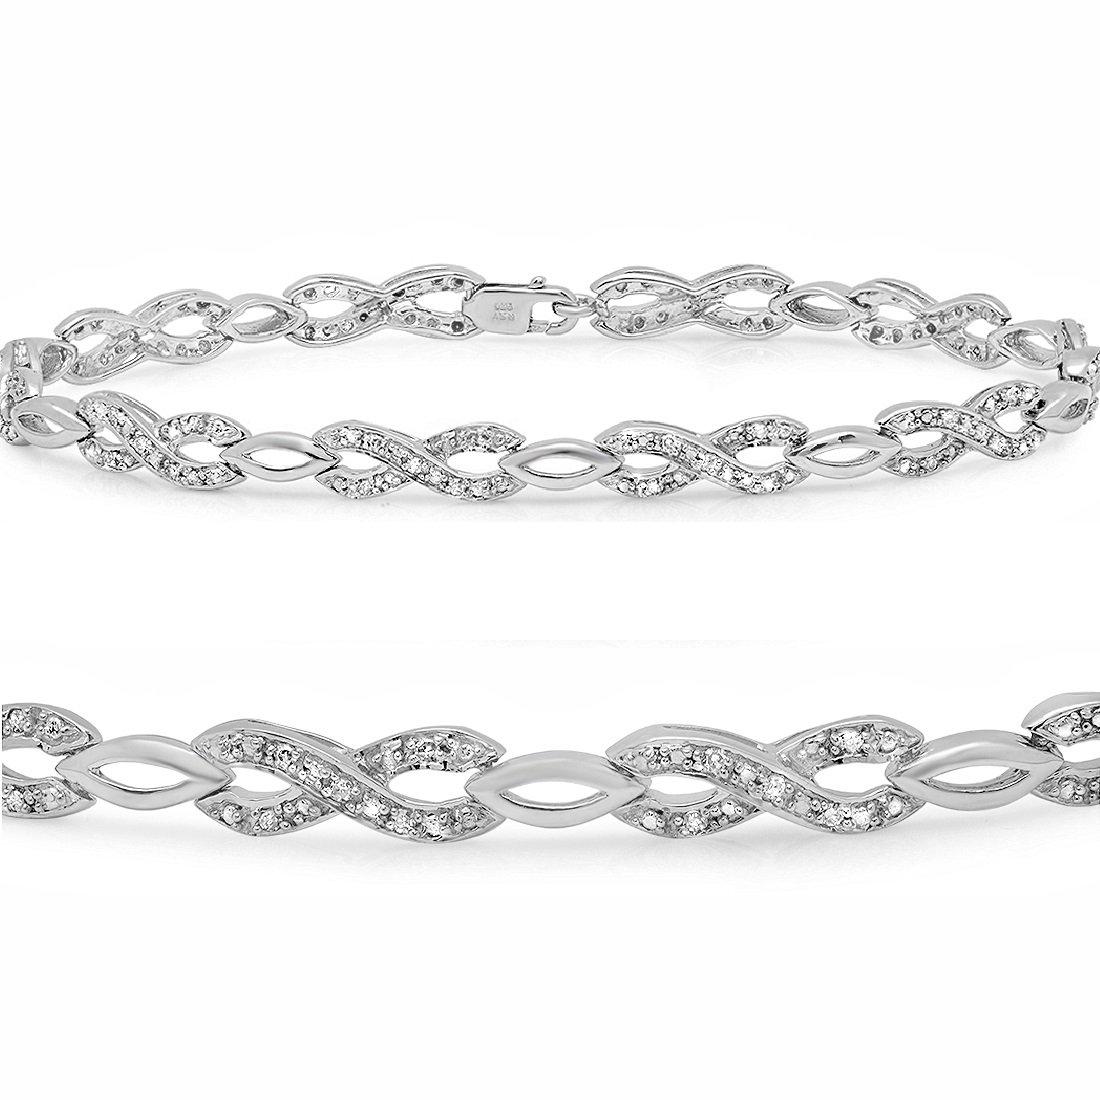 AGS Certified 1/4ct Infinity Diamond Tennis Bracelet in Sterling Silver 7 inch